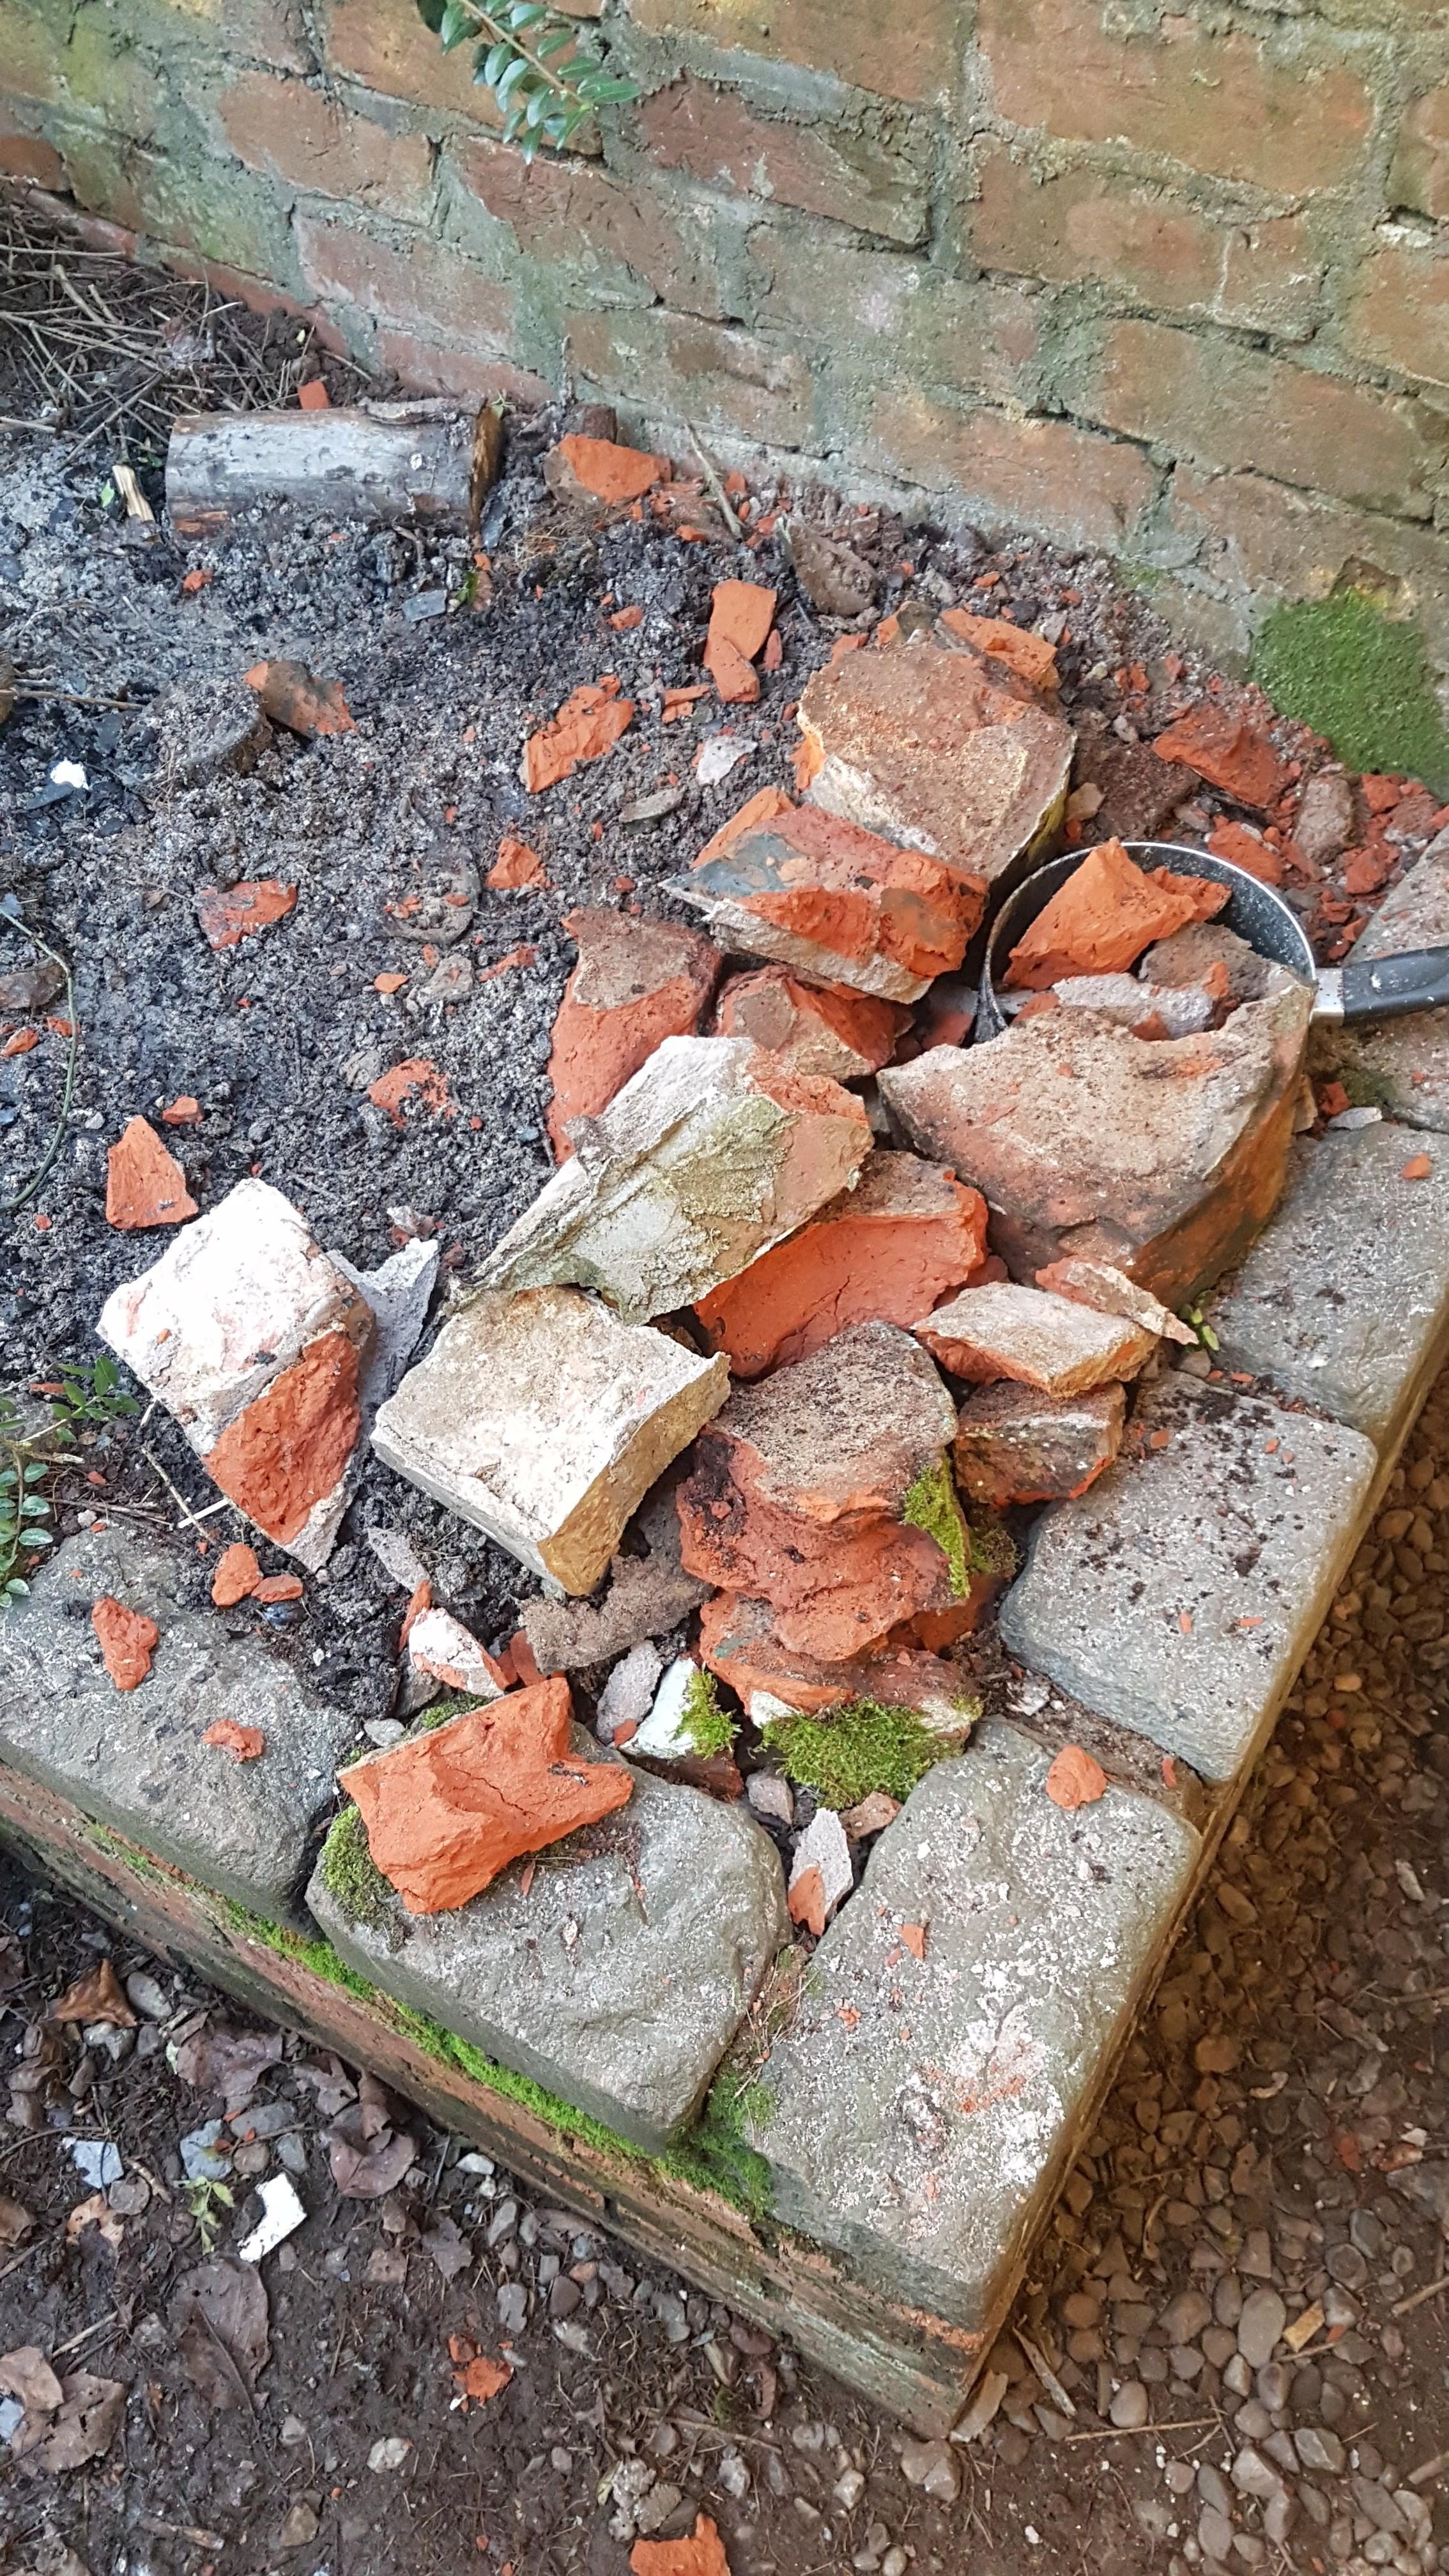 A pile of broken bricks.